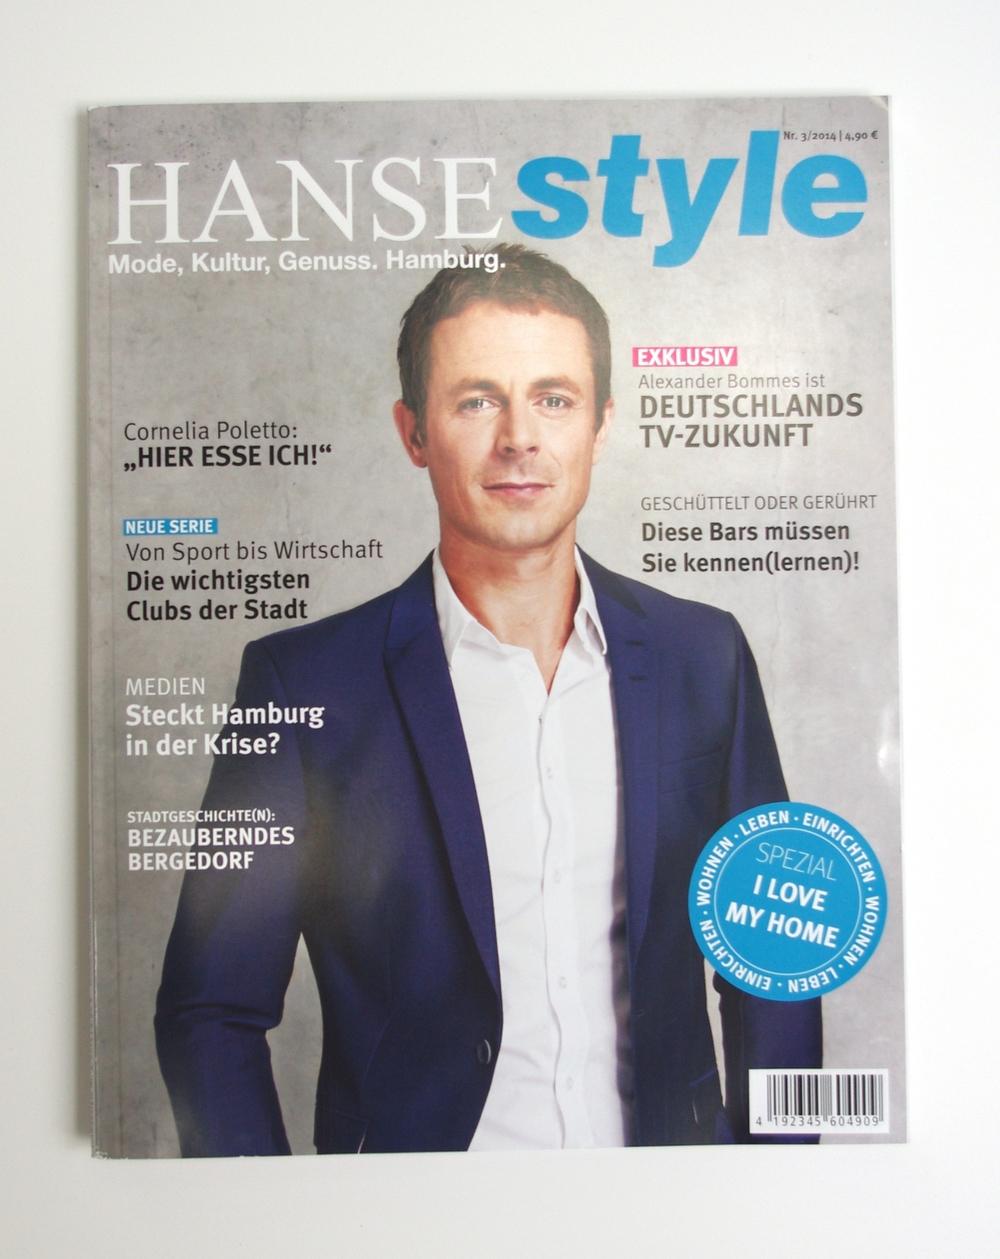 Oktober 2014: Hansestyle